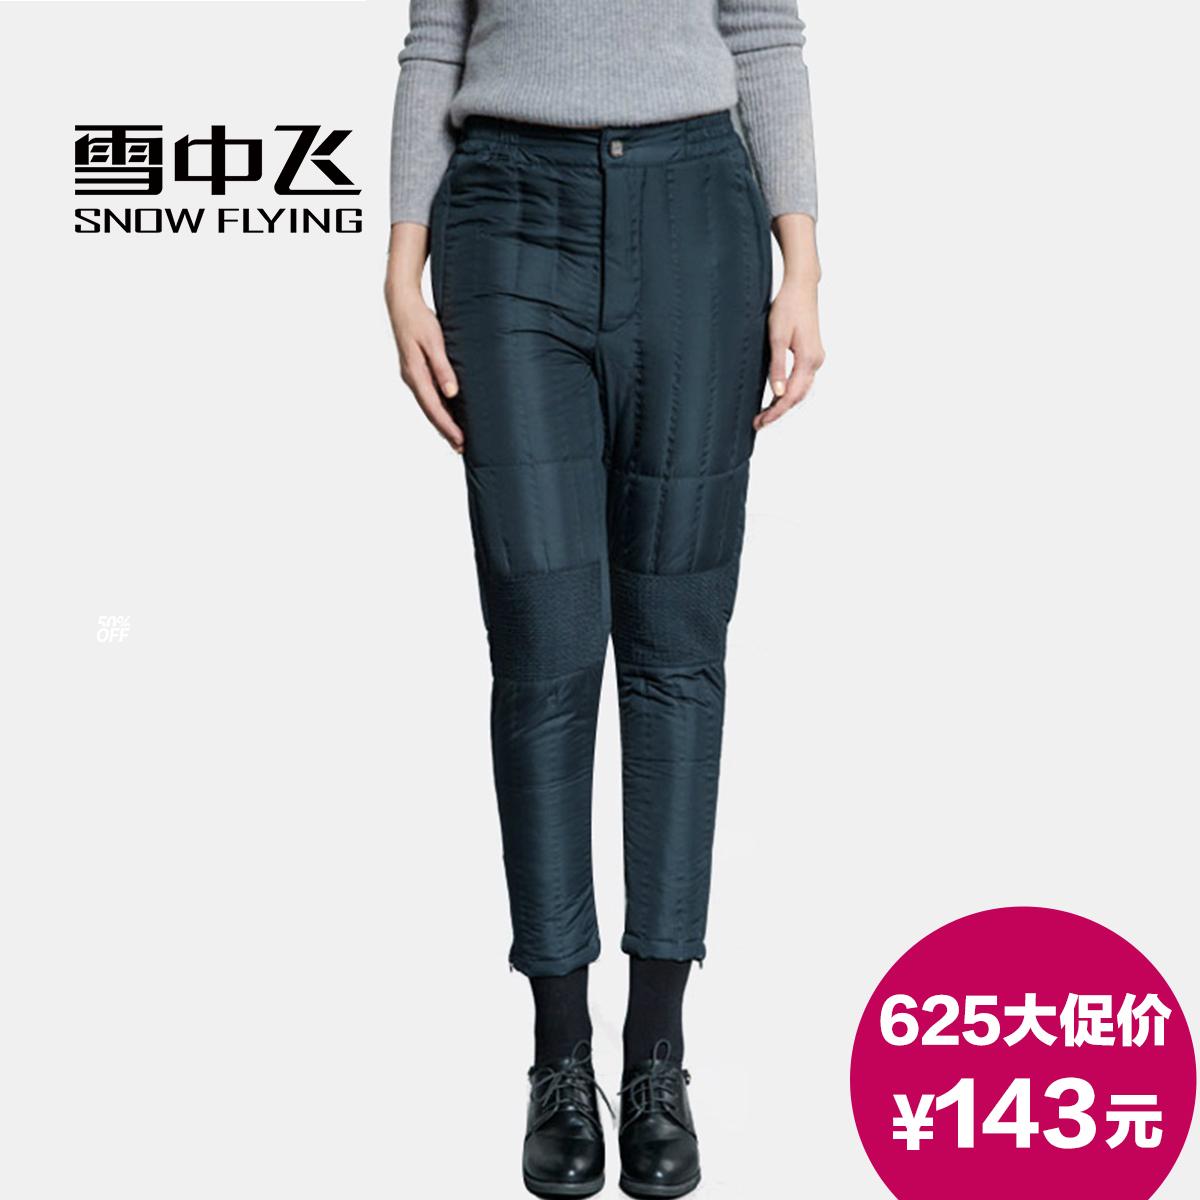 Женские утепленные штаны SNOW FLYING x 1301204 X1301204